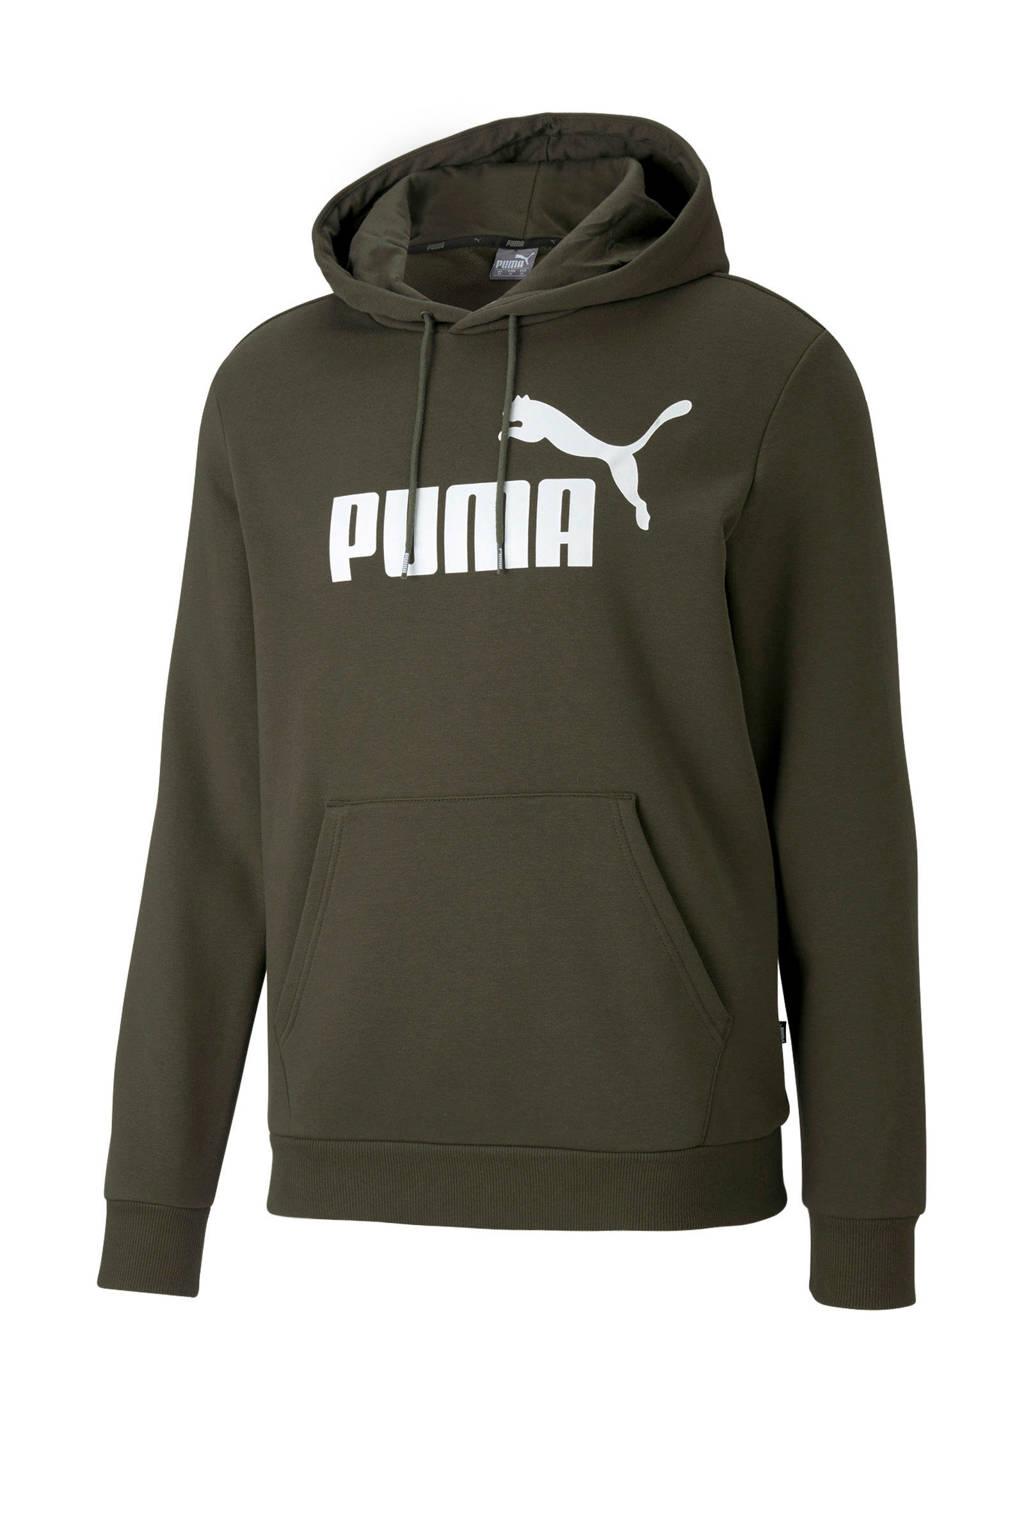 Puma   hoodie kaki, Kaki